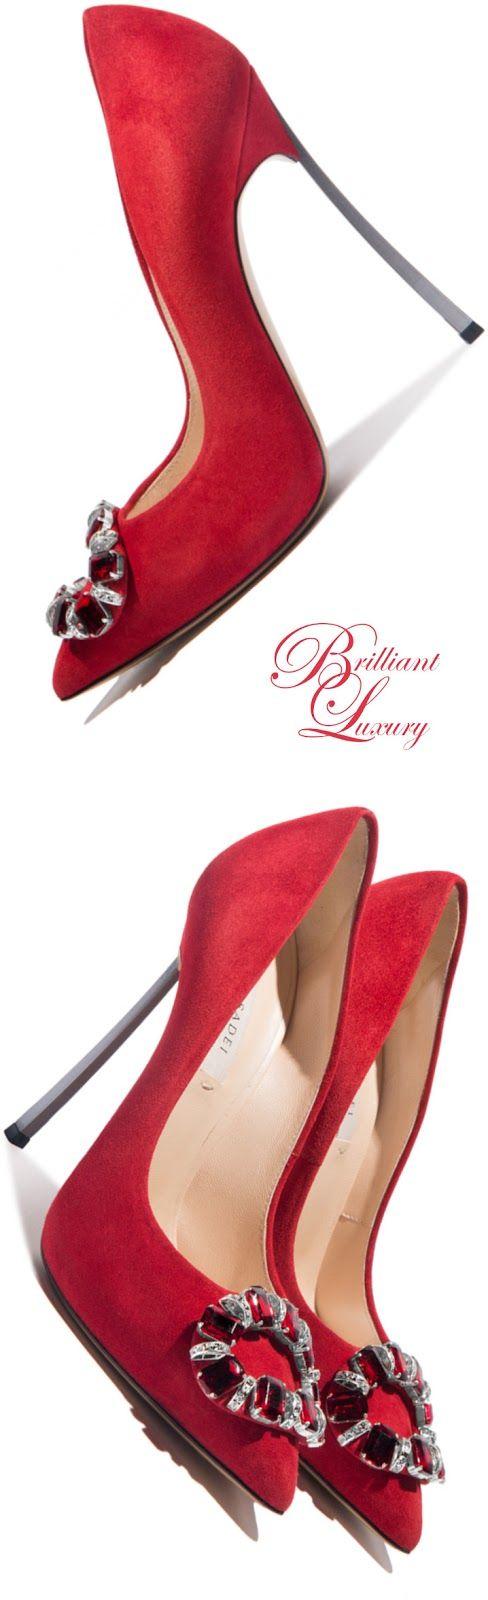 Brilliant Luxury * Casadei 'Blade' Fall 2015 for more findings pls visit www.pinterest.com/escherpescarves/